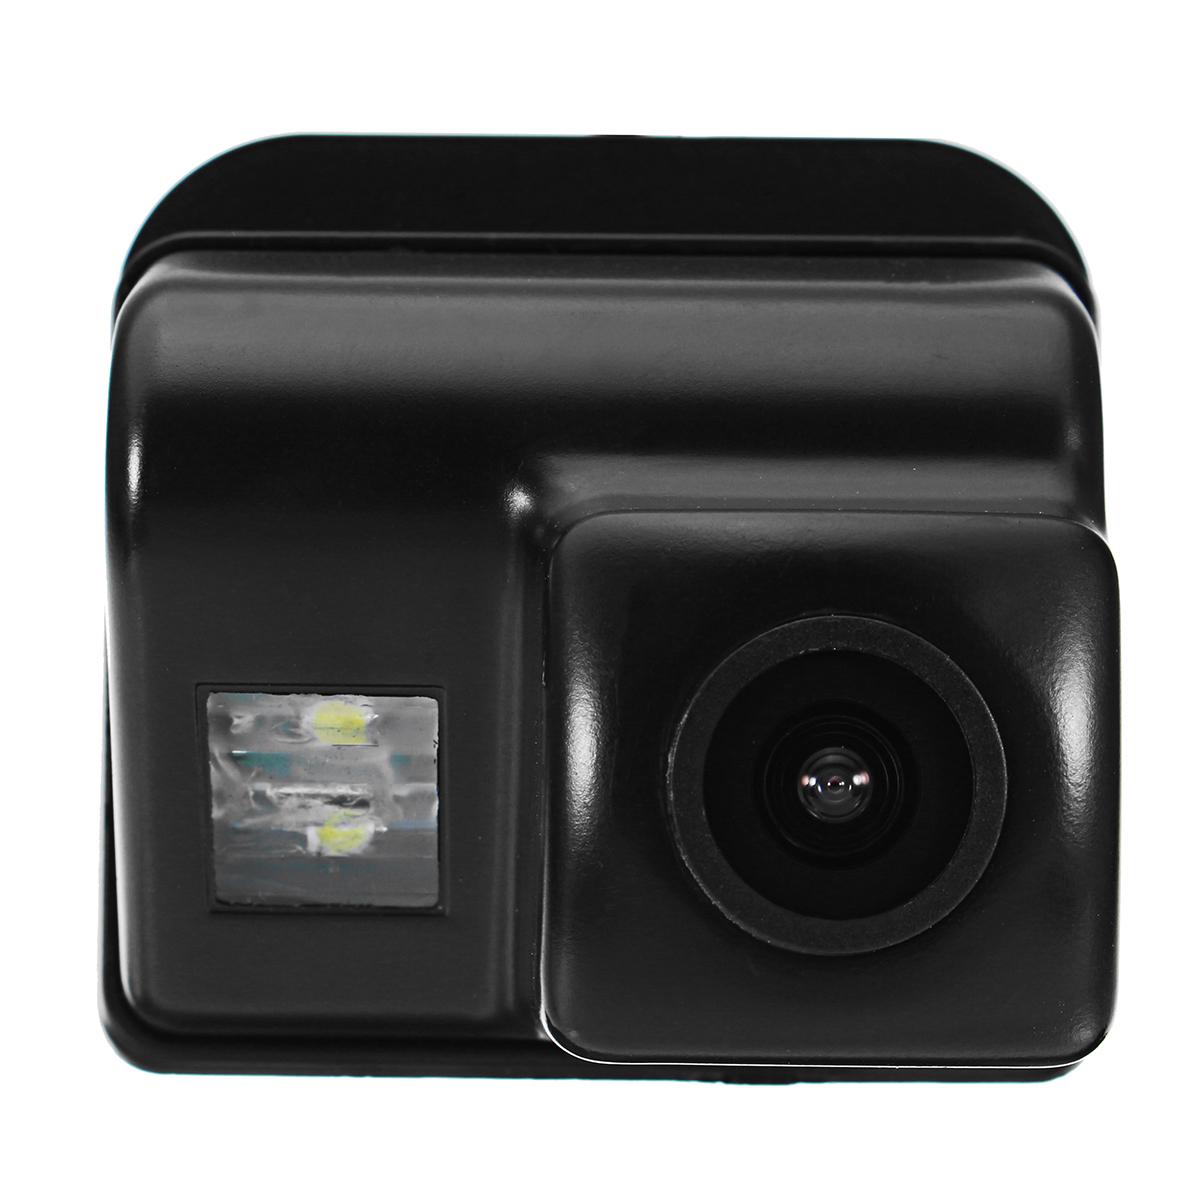 Waterproof HD Rearview Backup Camera Night Vision for Mazda CX-5 CX-7 CX-9 Mazda 3 Mazda 6